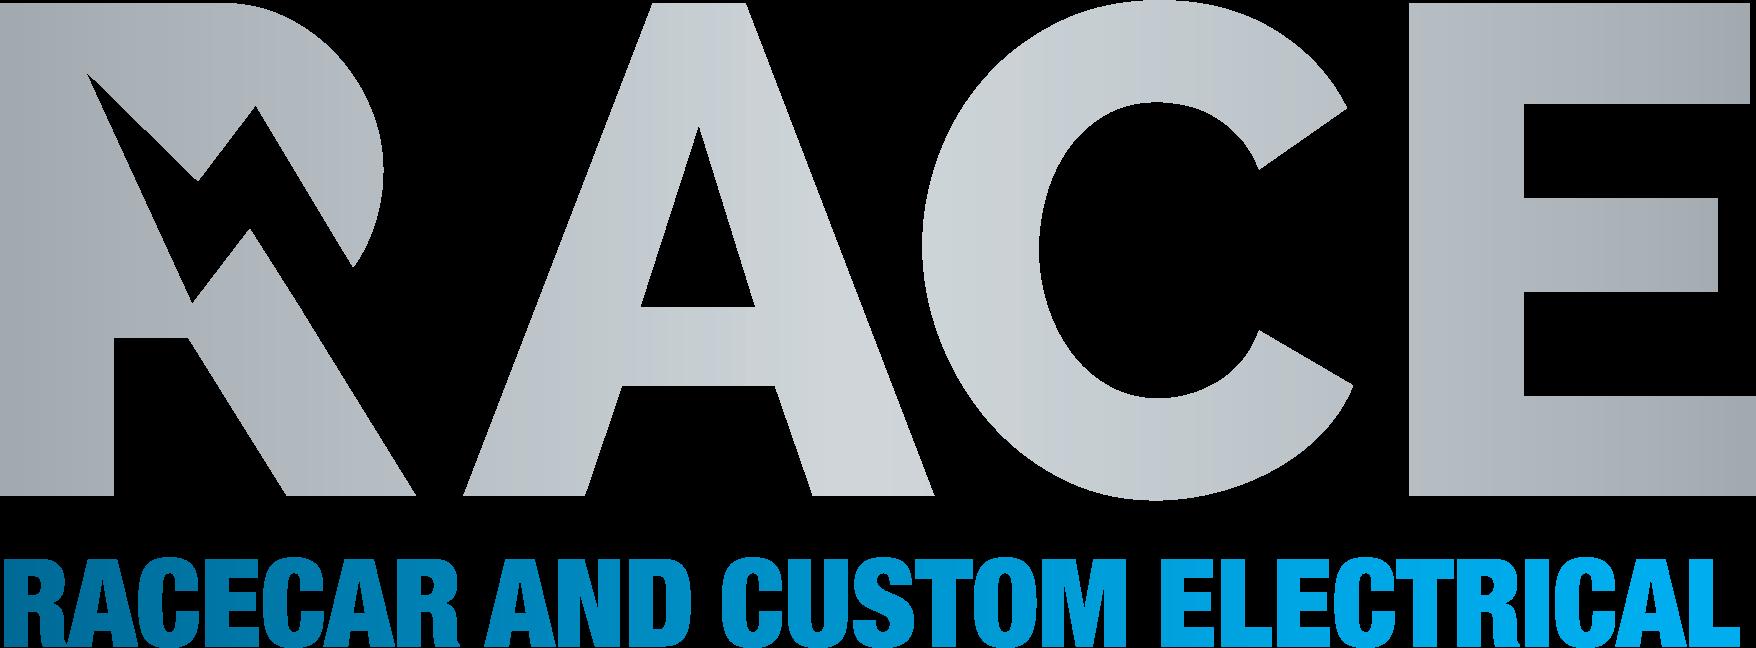 Race Car and Custom Electrical